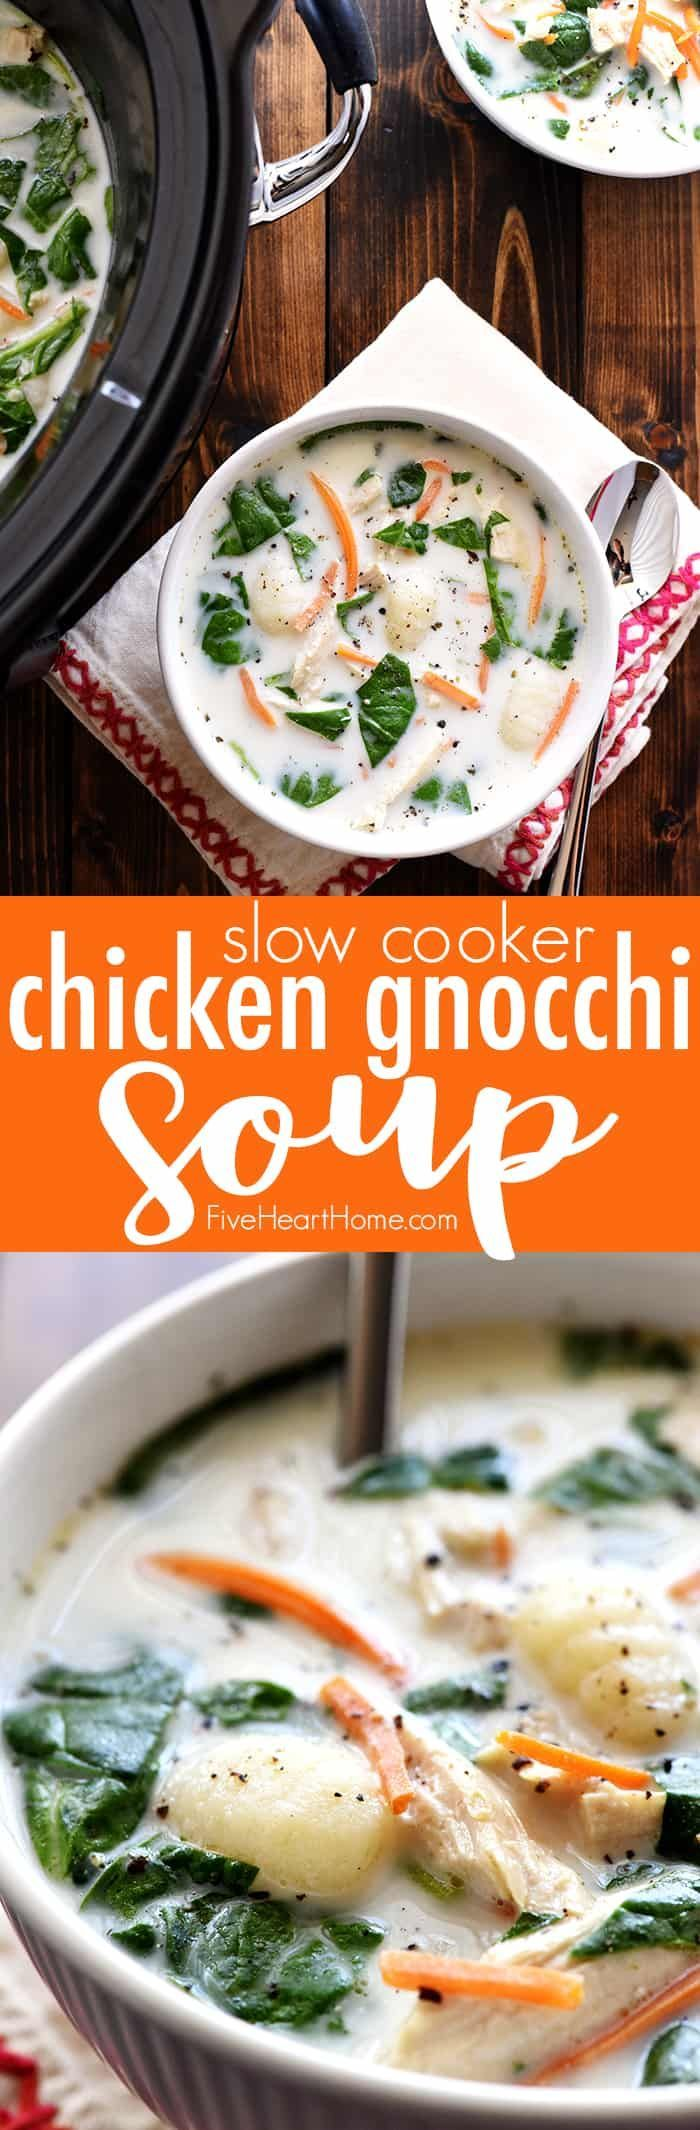 Slow Cooker Chicken Gnocchi Soup a creamy, lightenedup